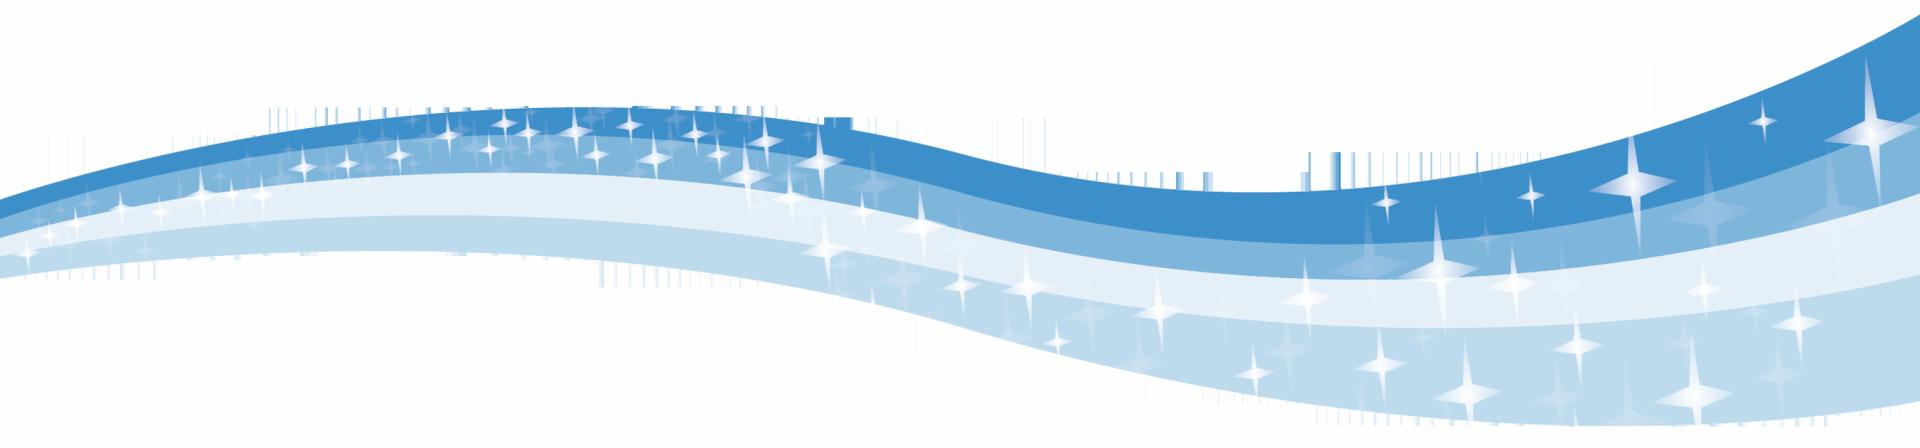 Wavy design clipart